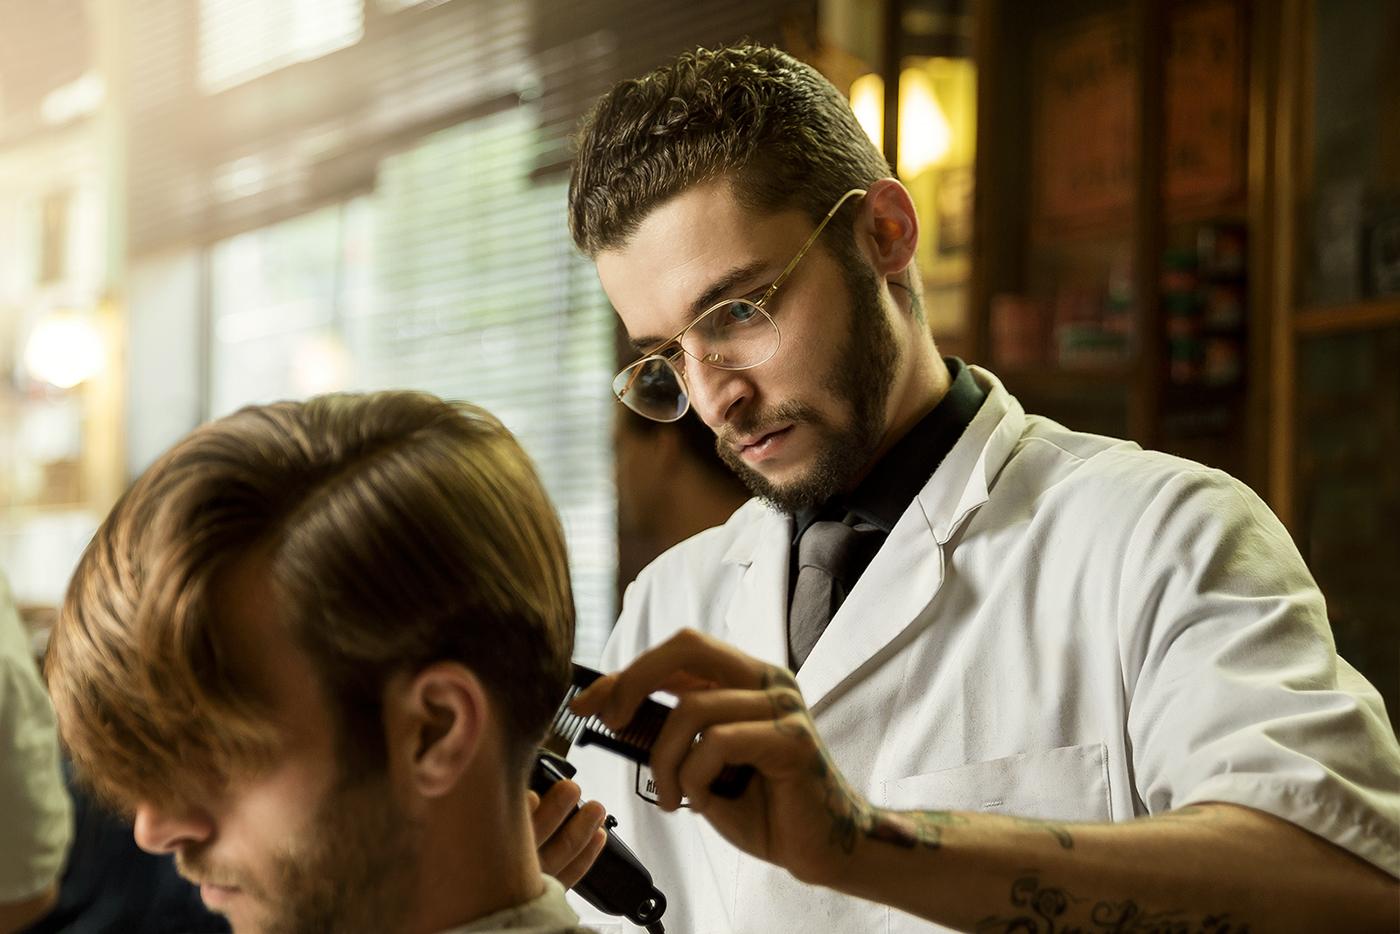 Schorem Haarsnijder Amp Barbier On Behance